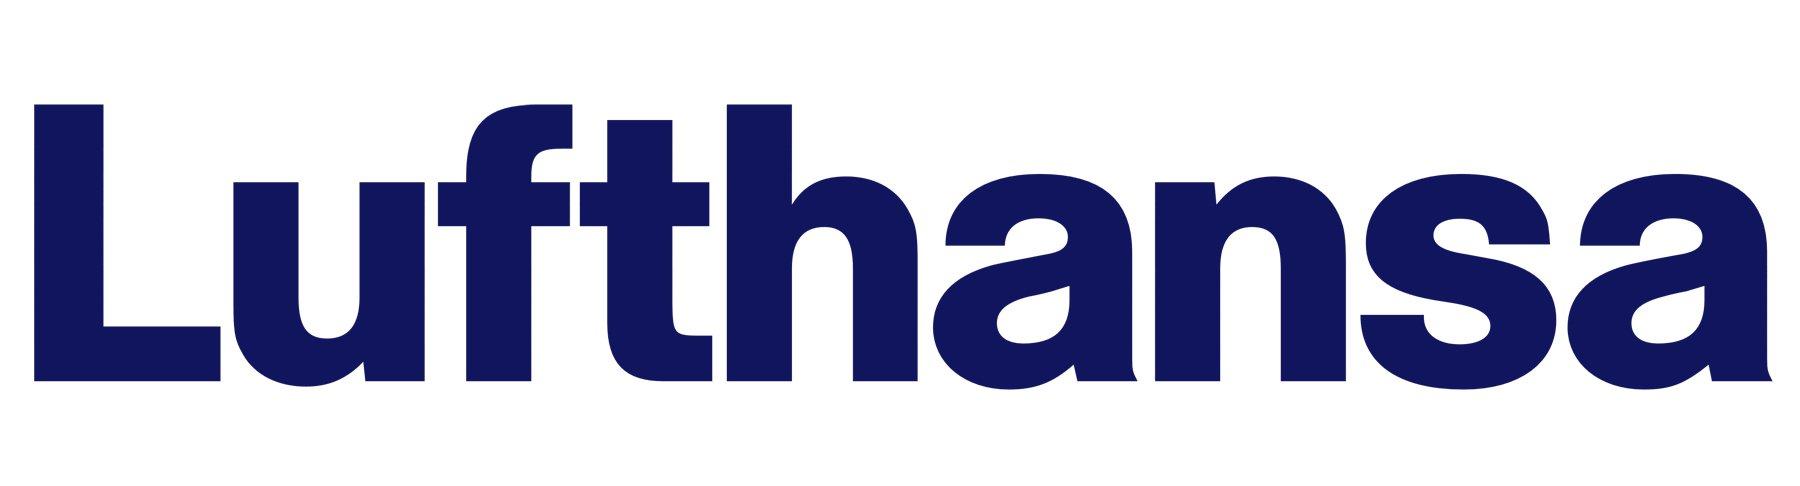 Lufthansa Logo, Lufthansa Symbol Meaning, History and ...